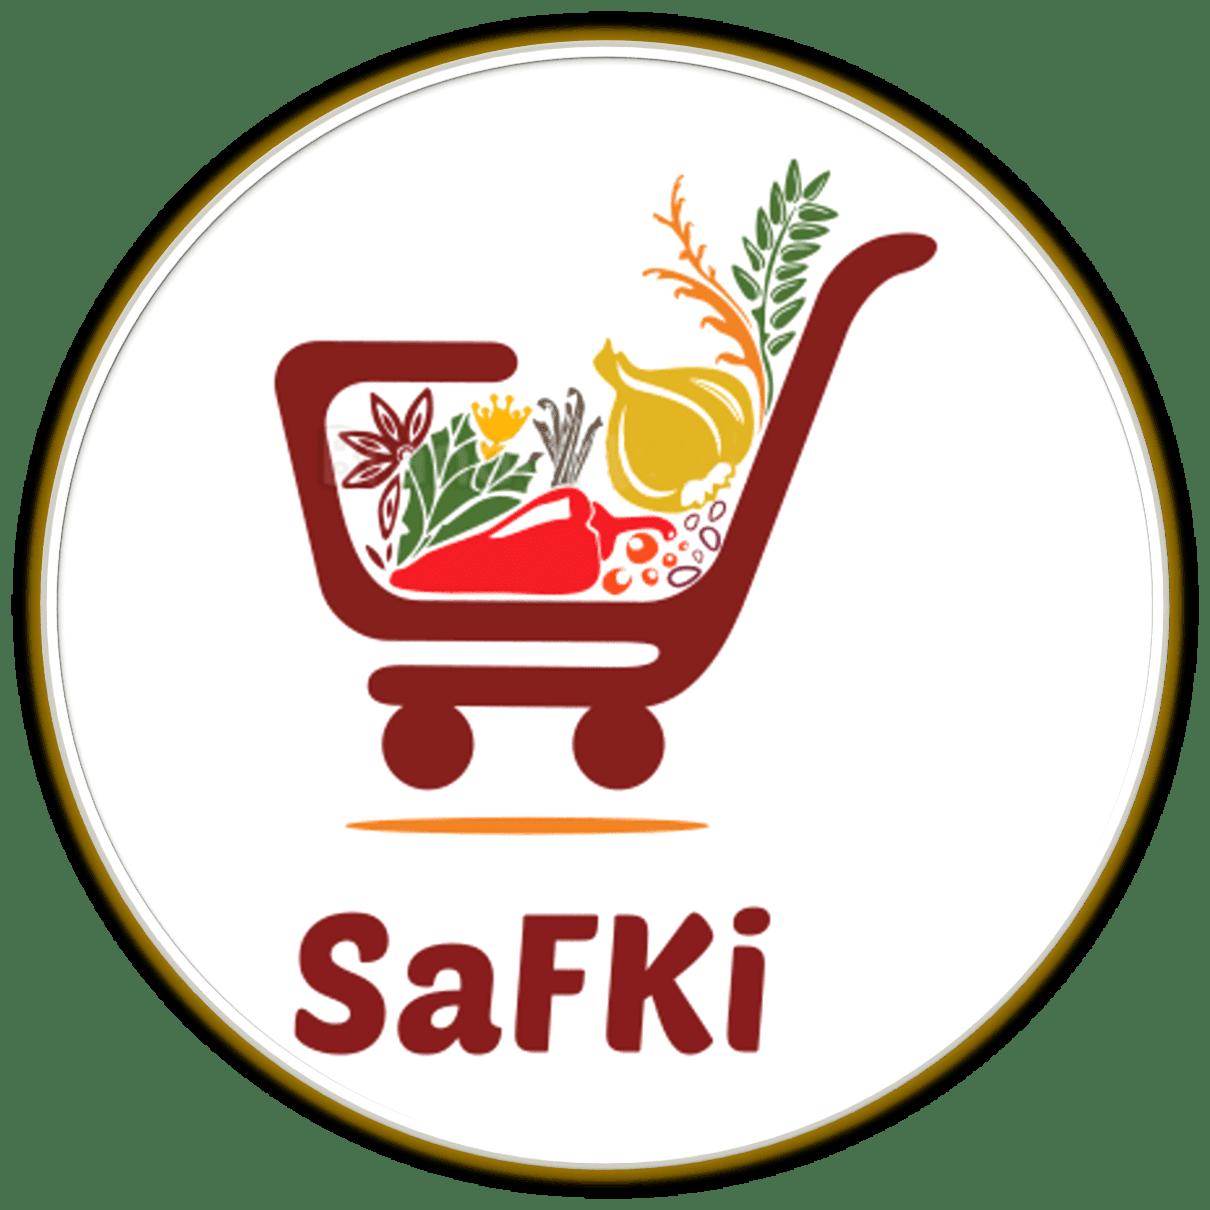 Safki